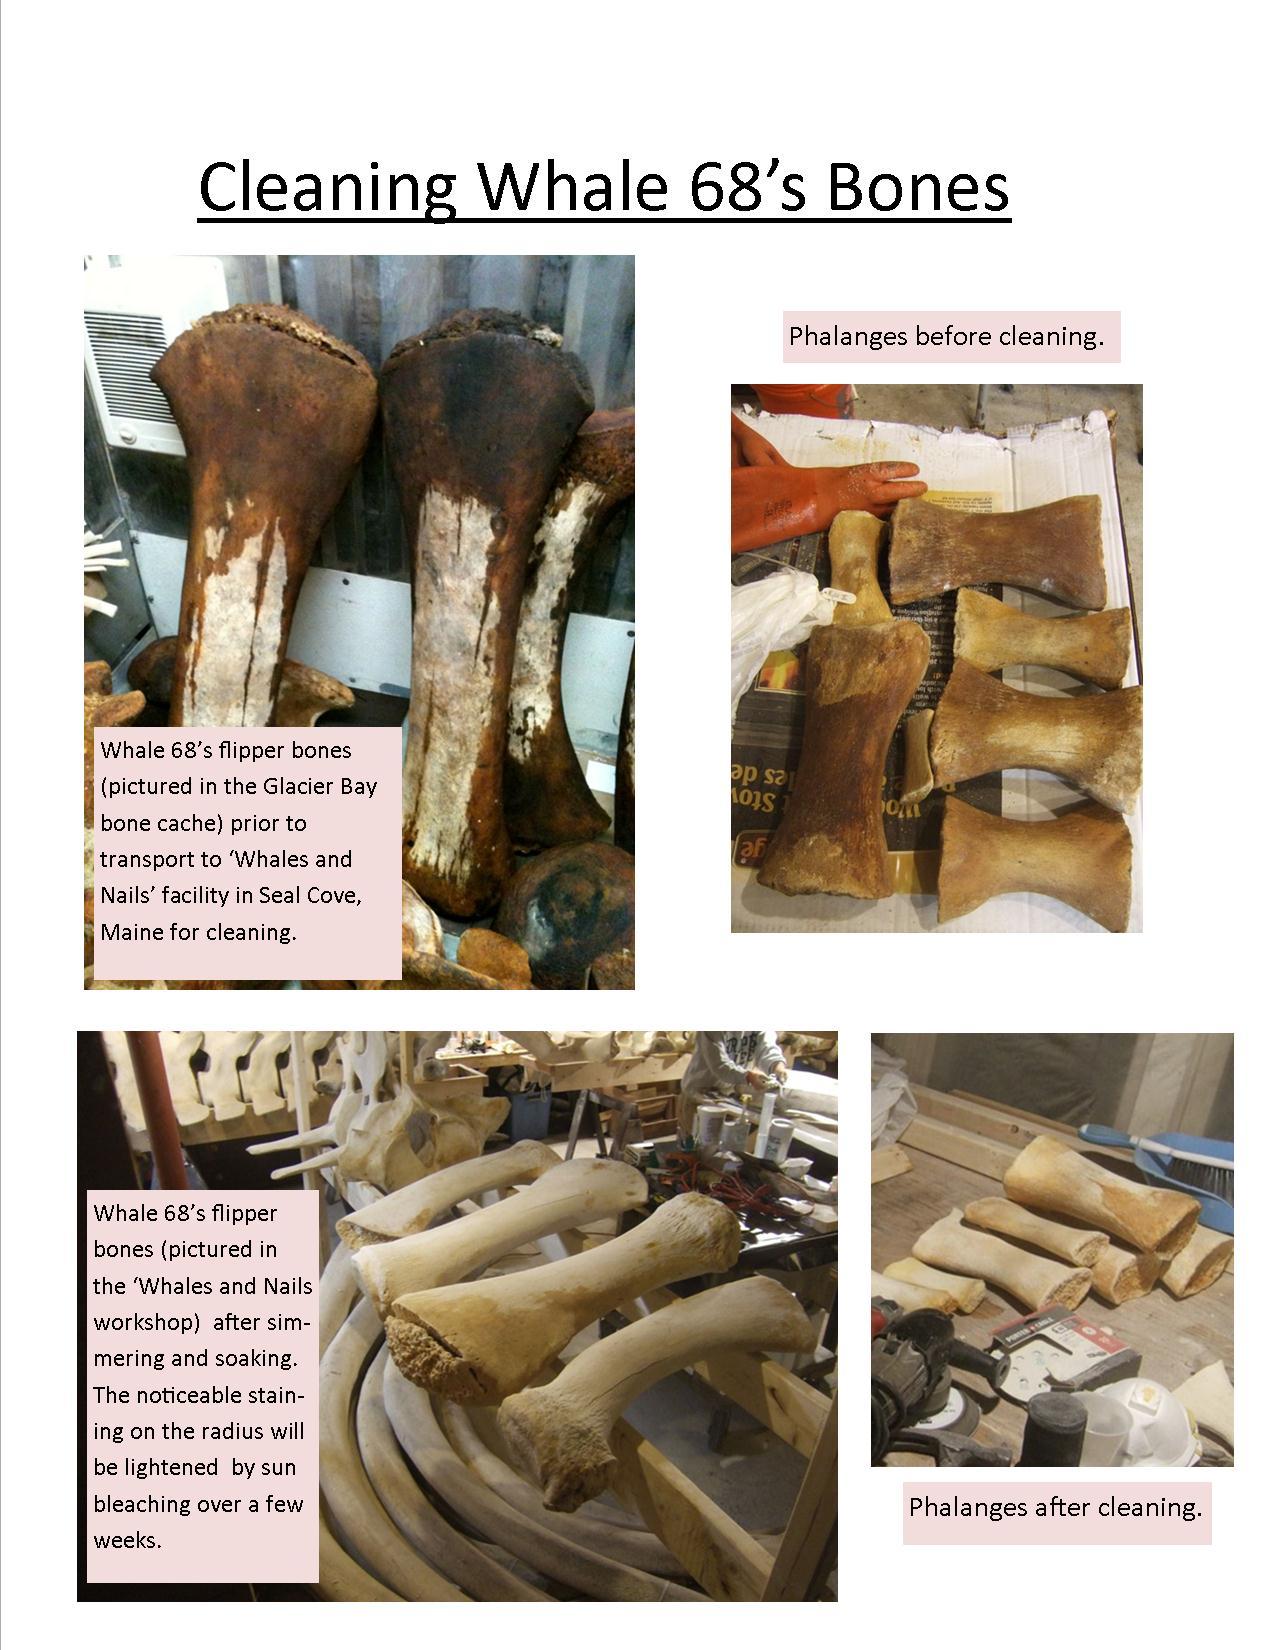 Simmering And Soaking Whale Bones Glacier Bay National Park Preserve U S National Park Service The Return Of Whale 68